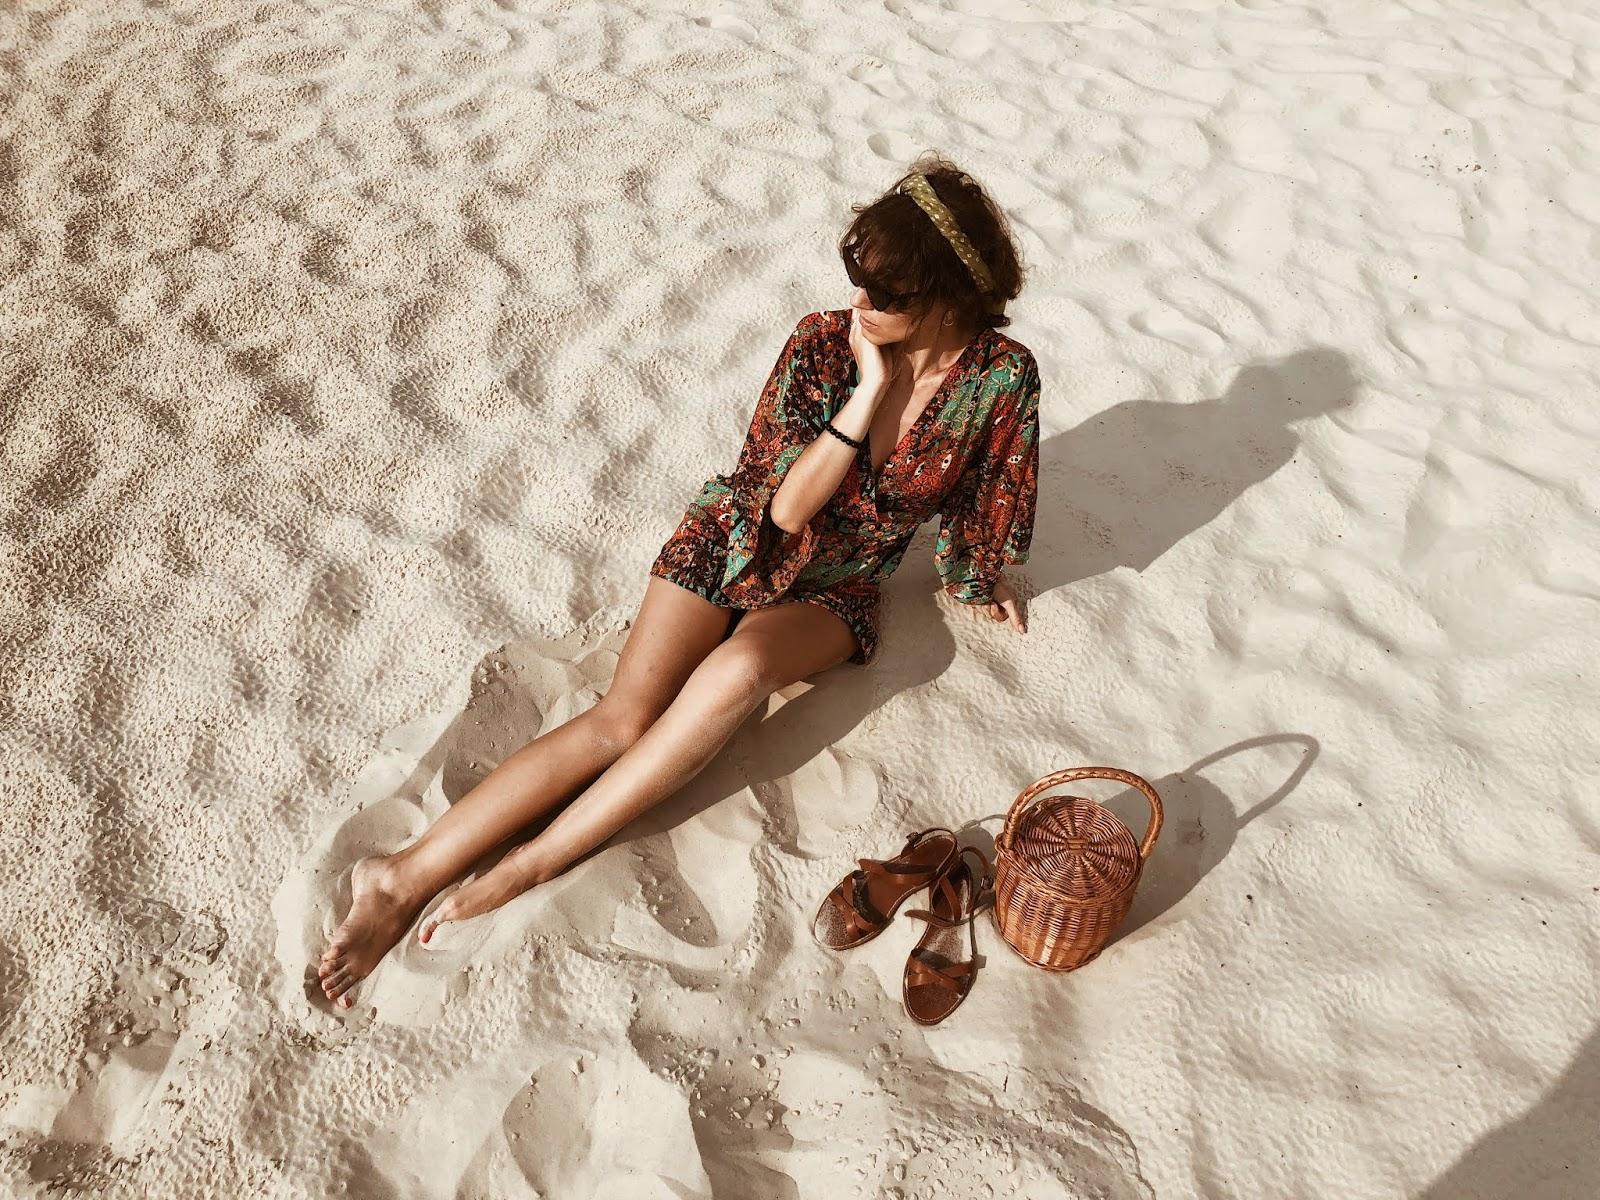 красивое фото на песке